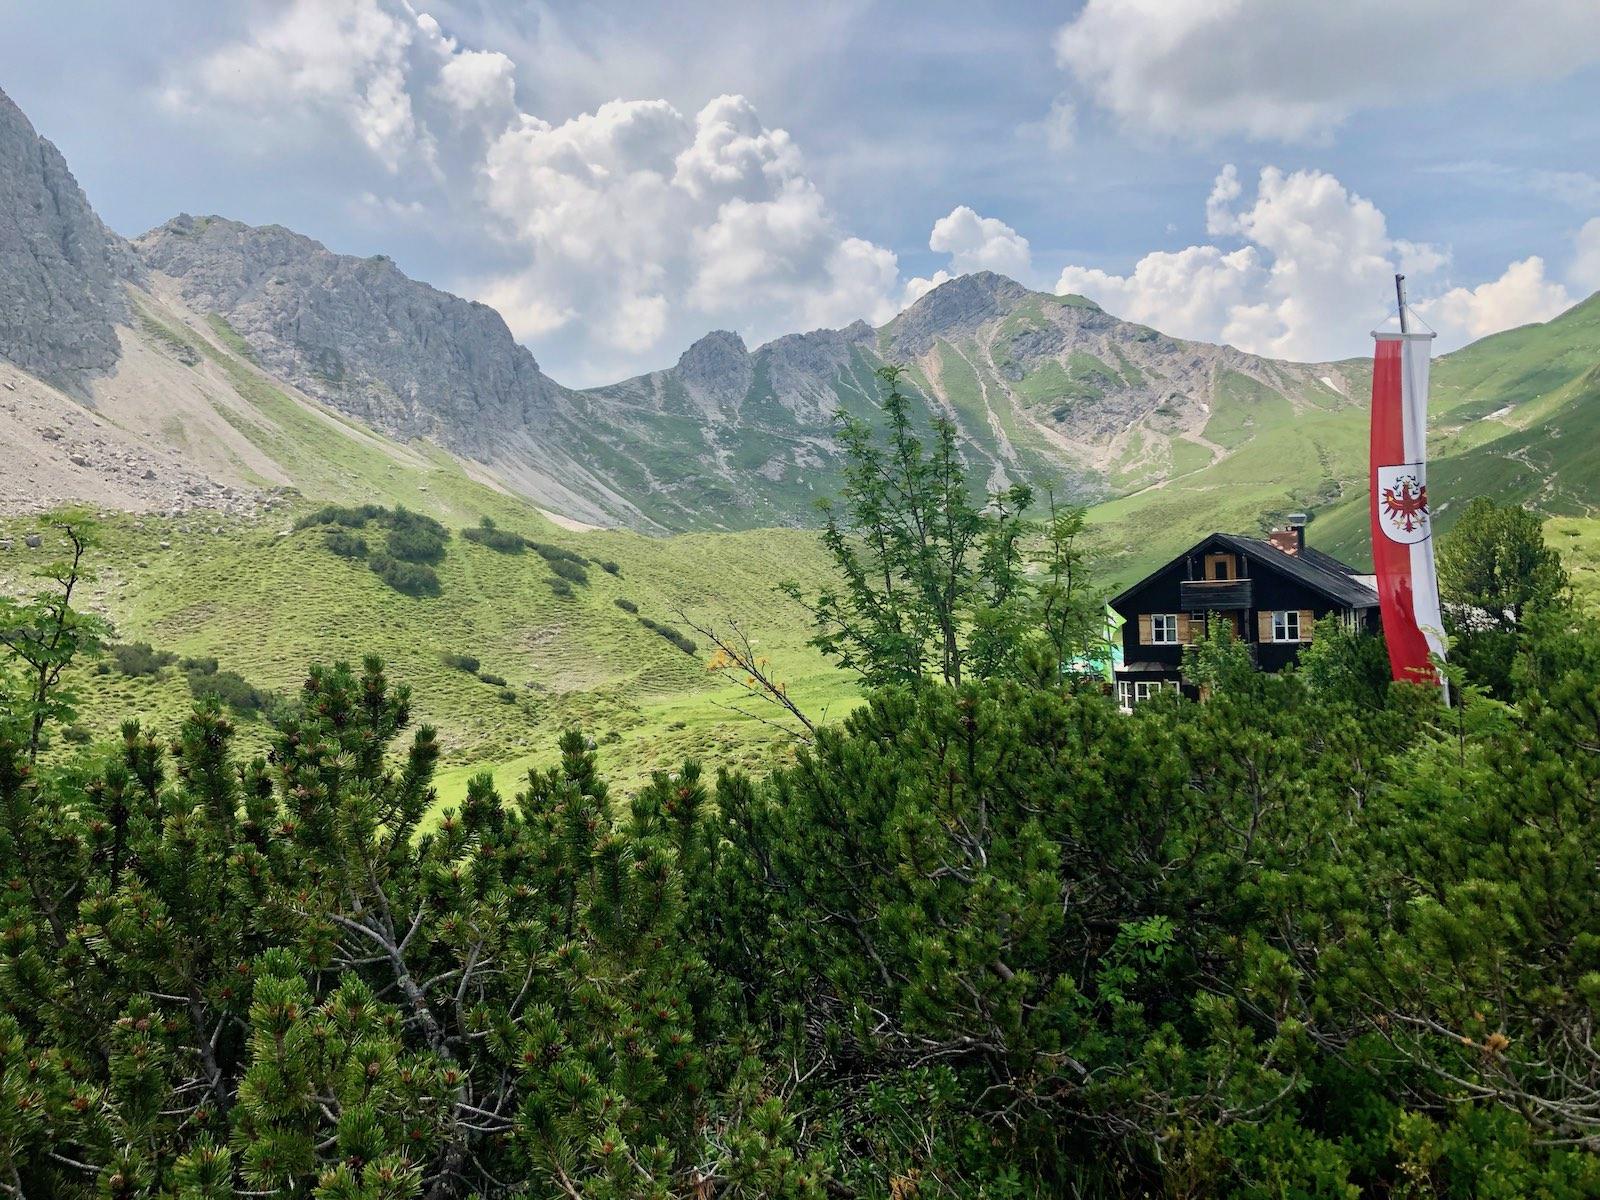 Die Landsberger Hütte